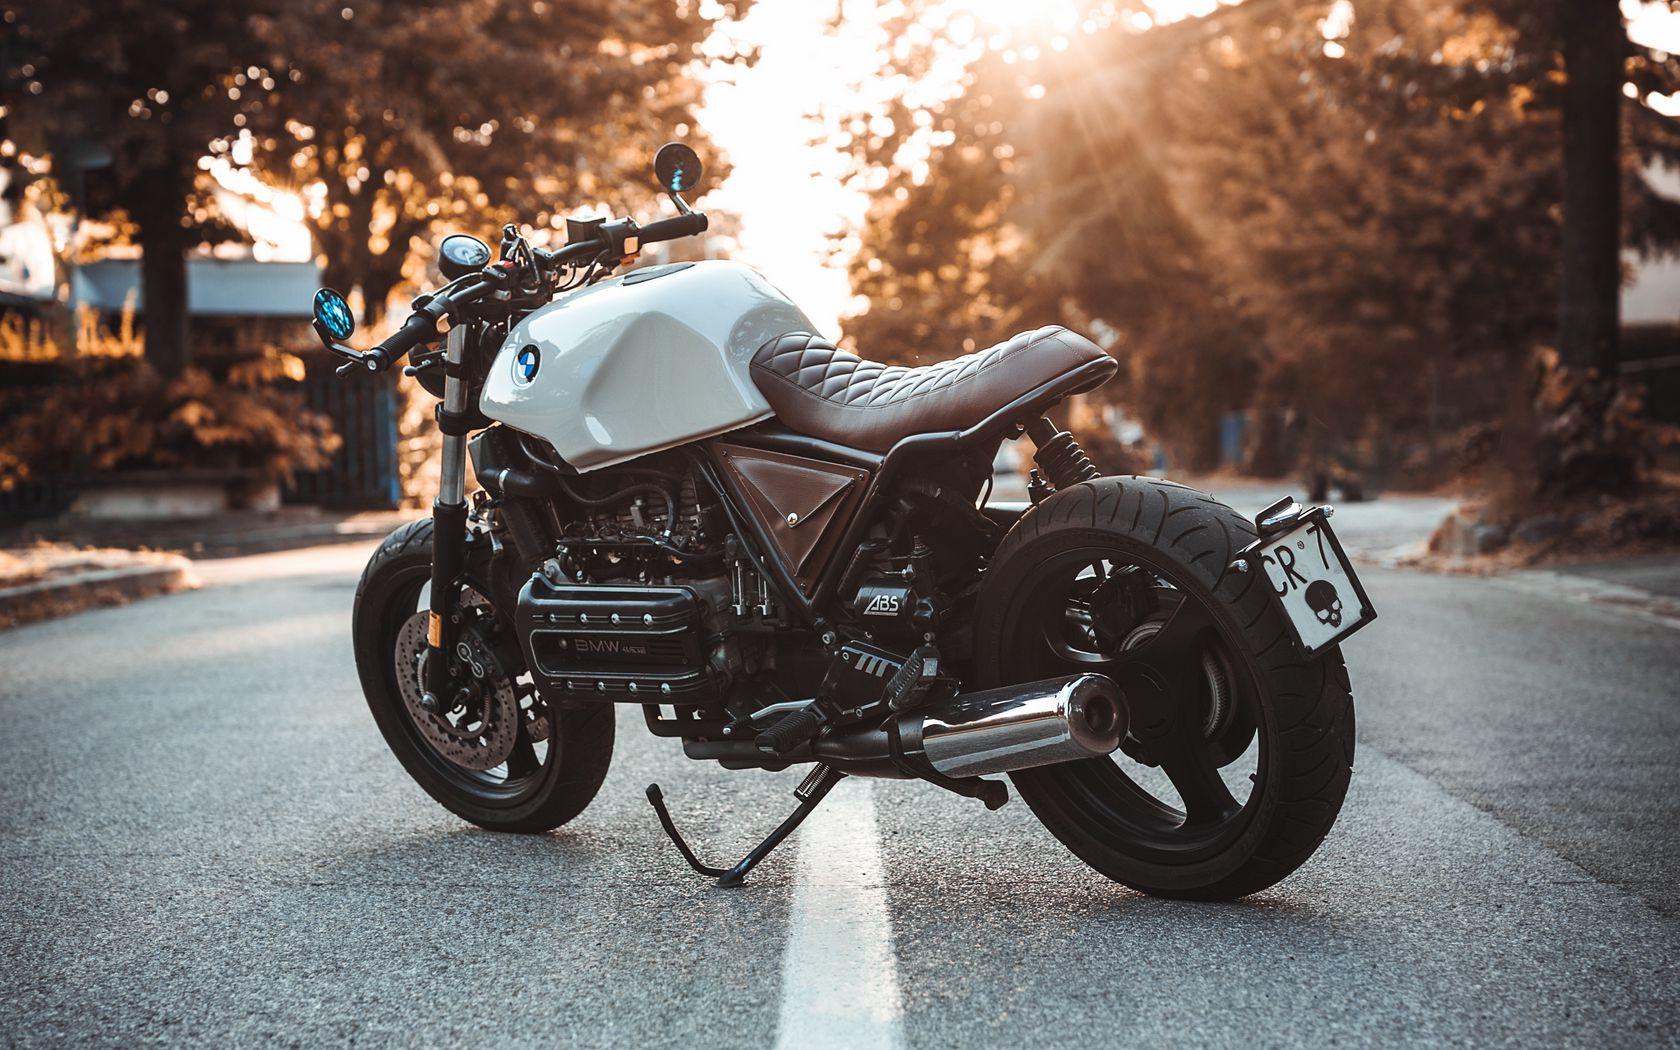 1680x1050 Обои bmw k100, мотоцикл, байк, вид сбоку